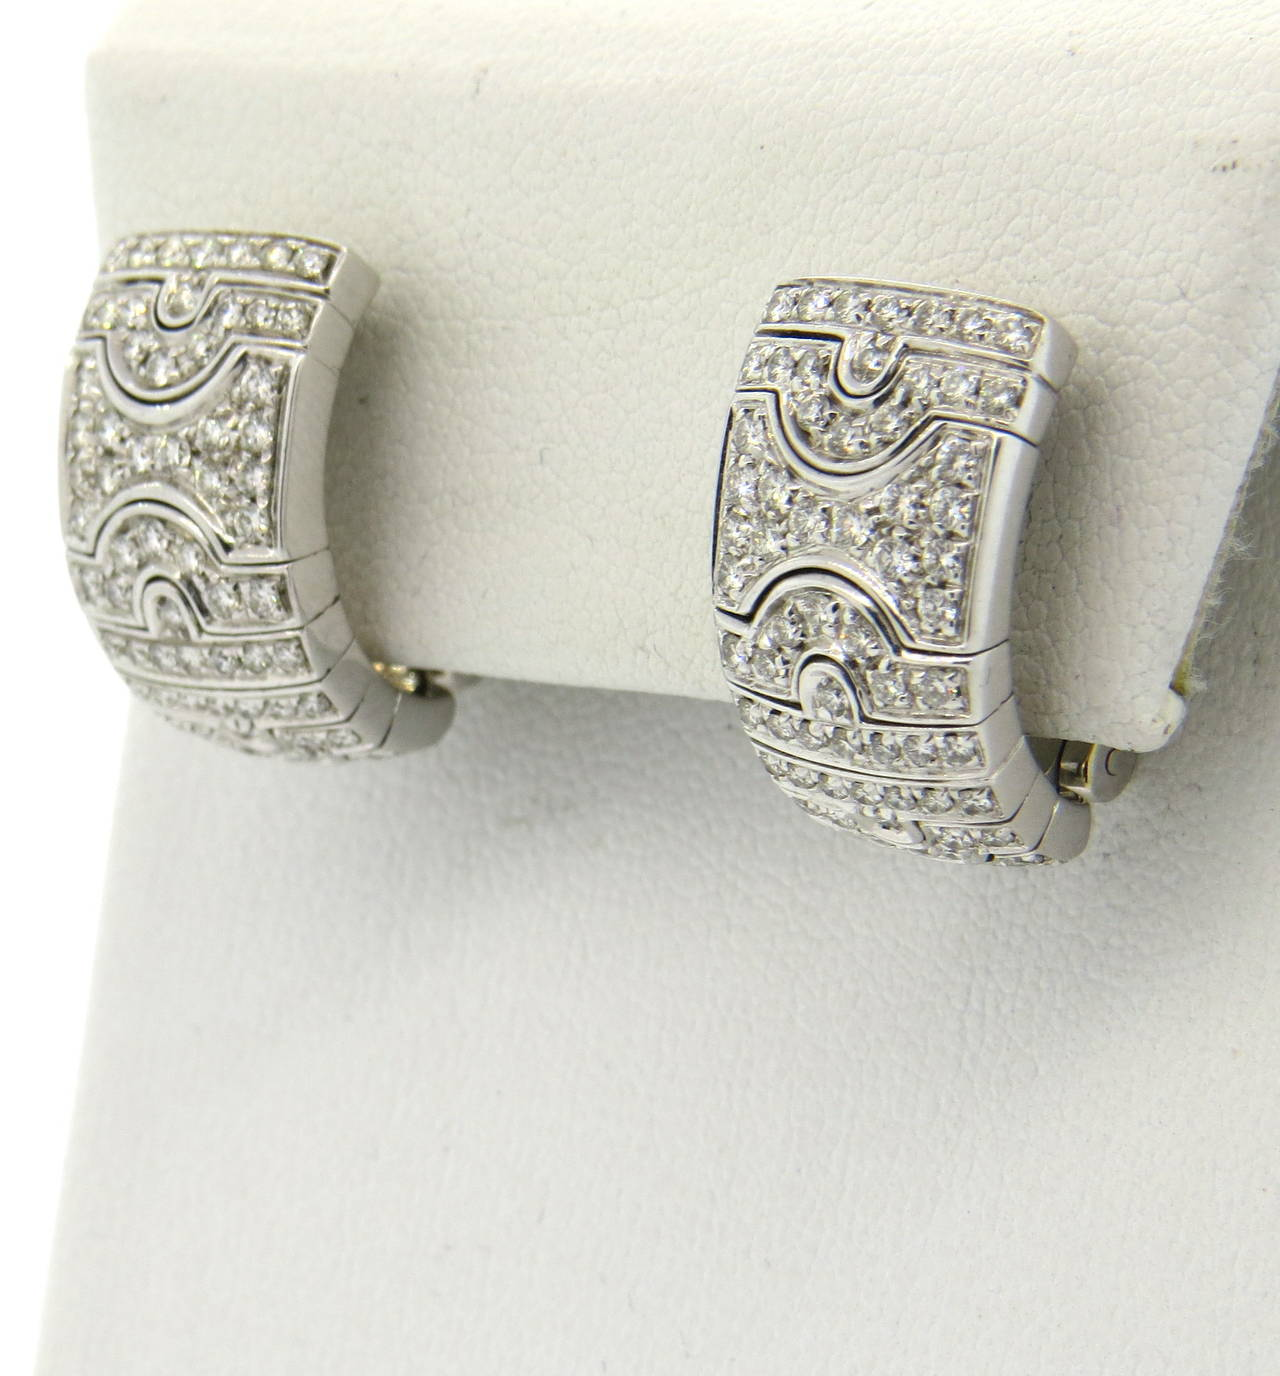 Bulgari Paesi Diamond Gold Half Hoop Earrings In Excellent Condition For Lahaska Pa